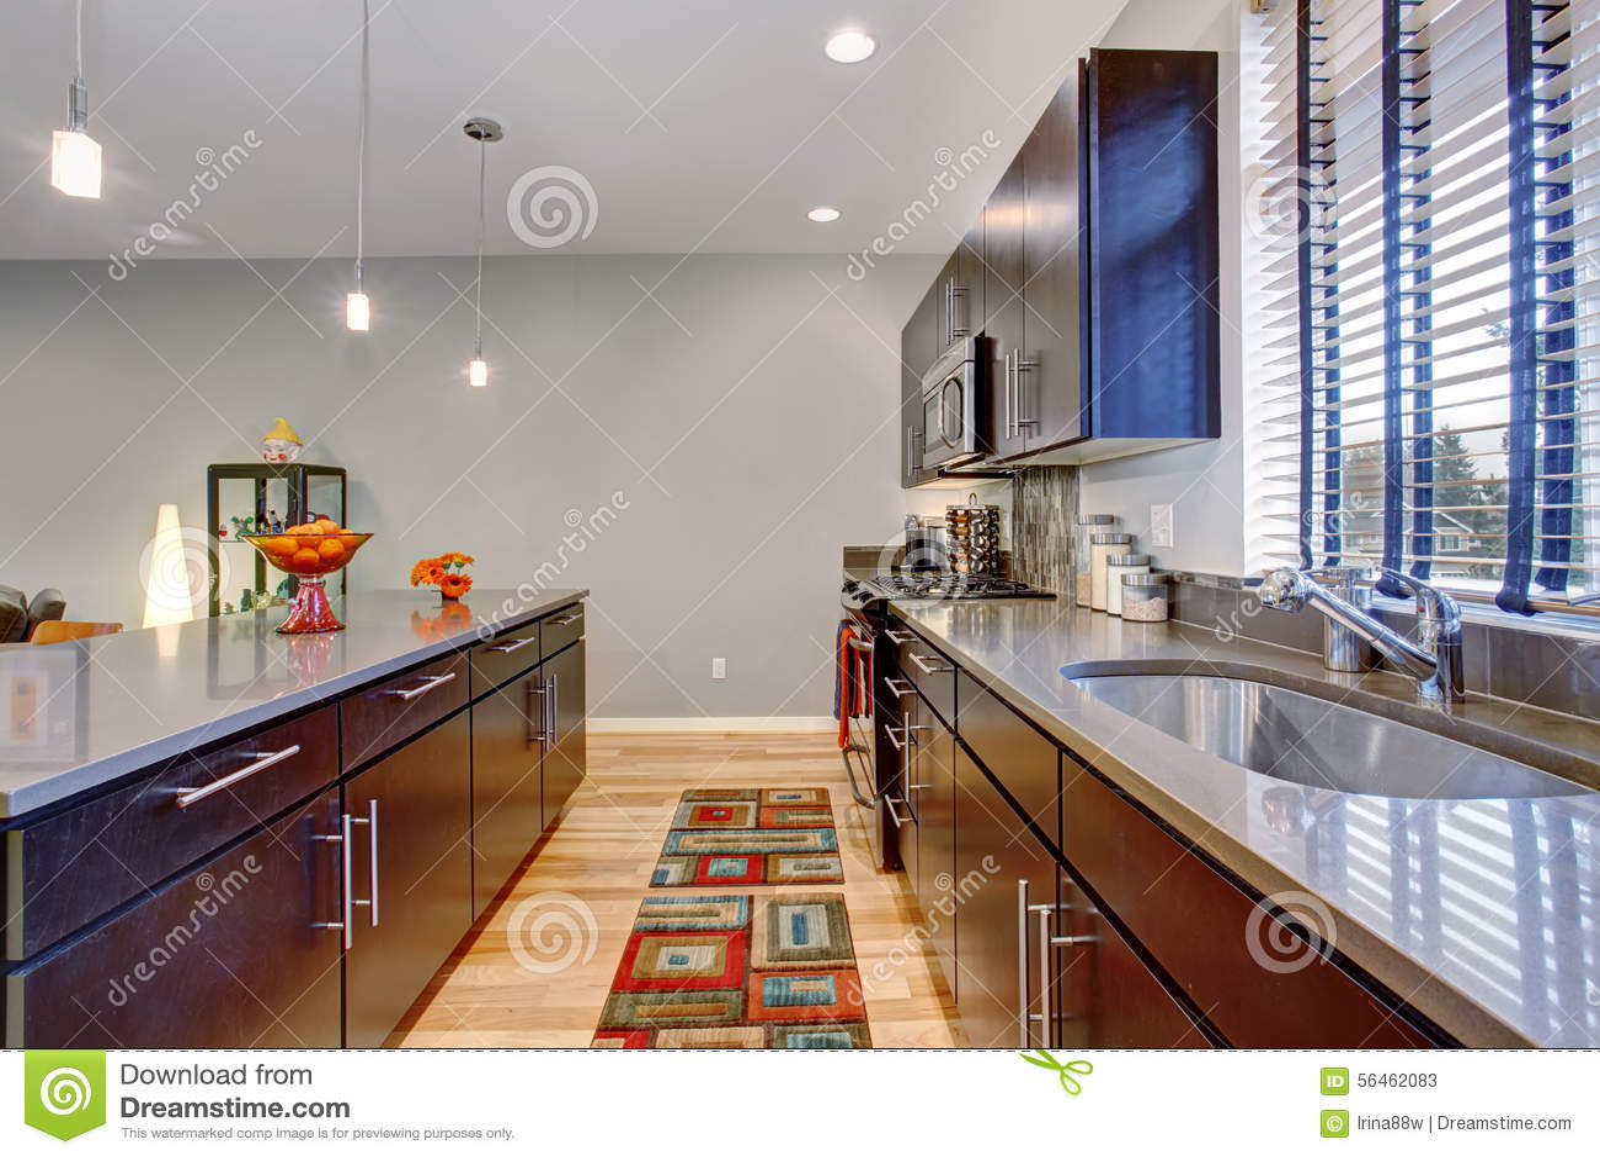 Moderne Retro Keuken : Retro keuken met moderne draai samen met hardhoutvloer stock